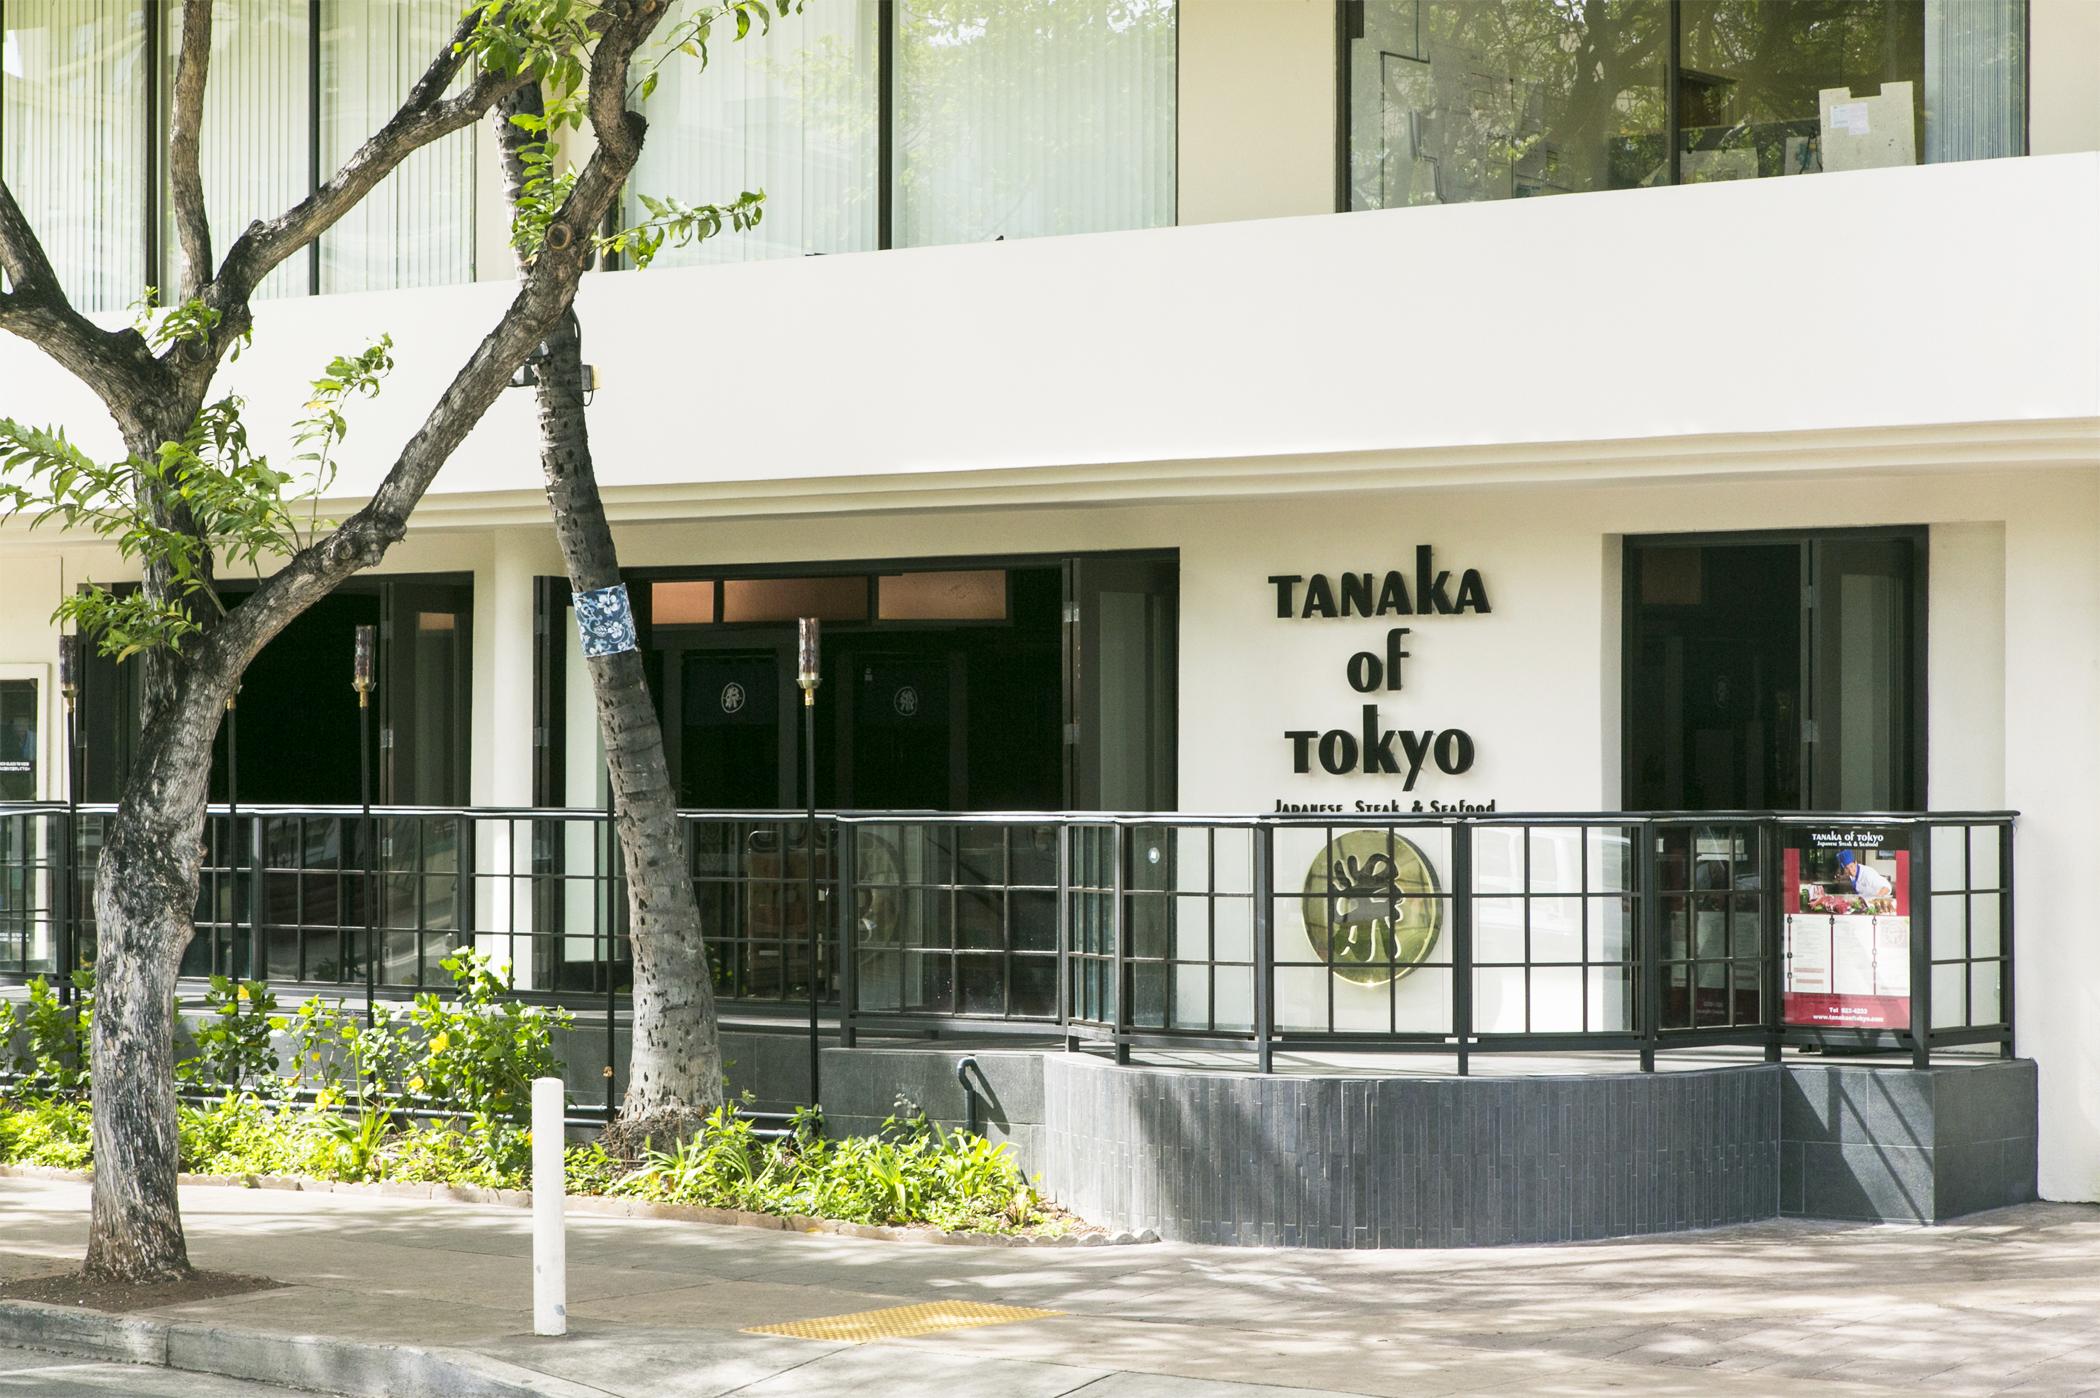 Tanaka_East Exterior15-4.jpg